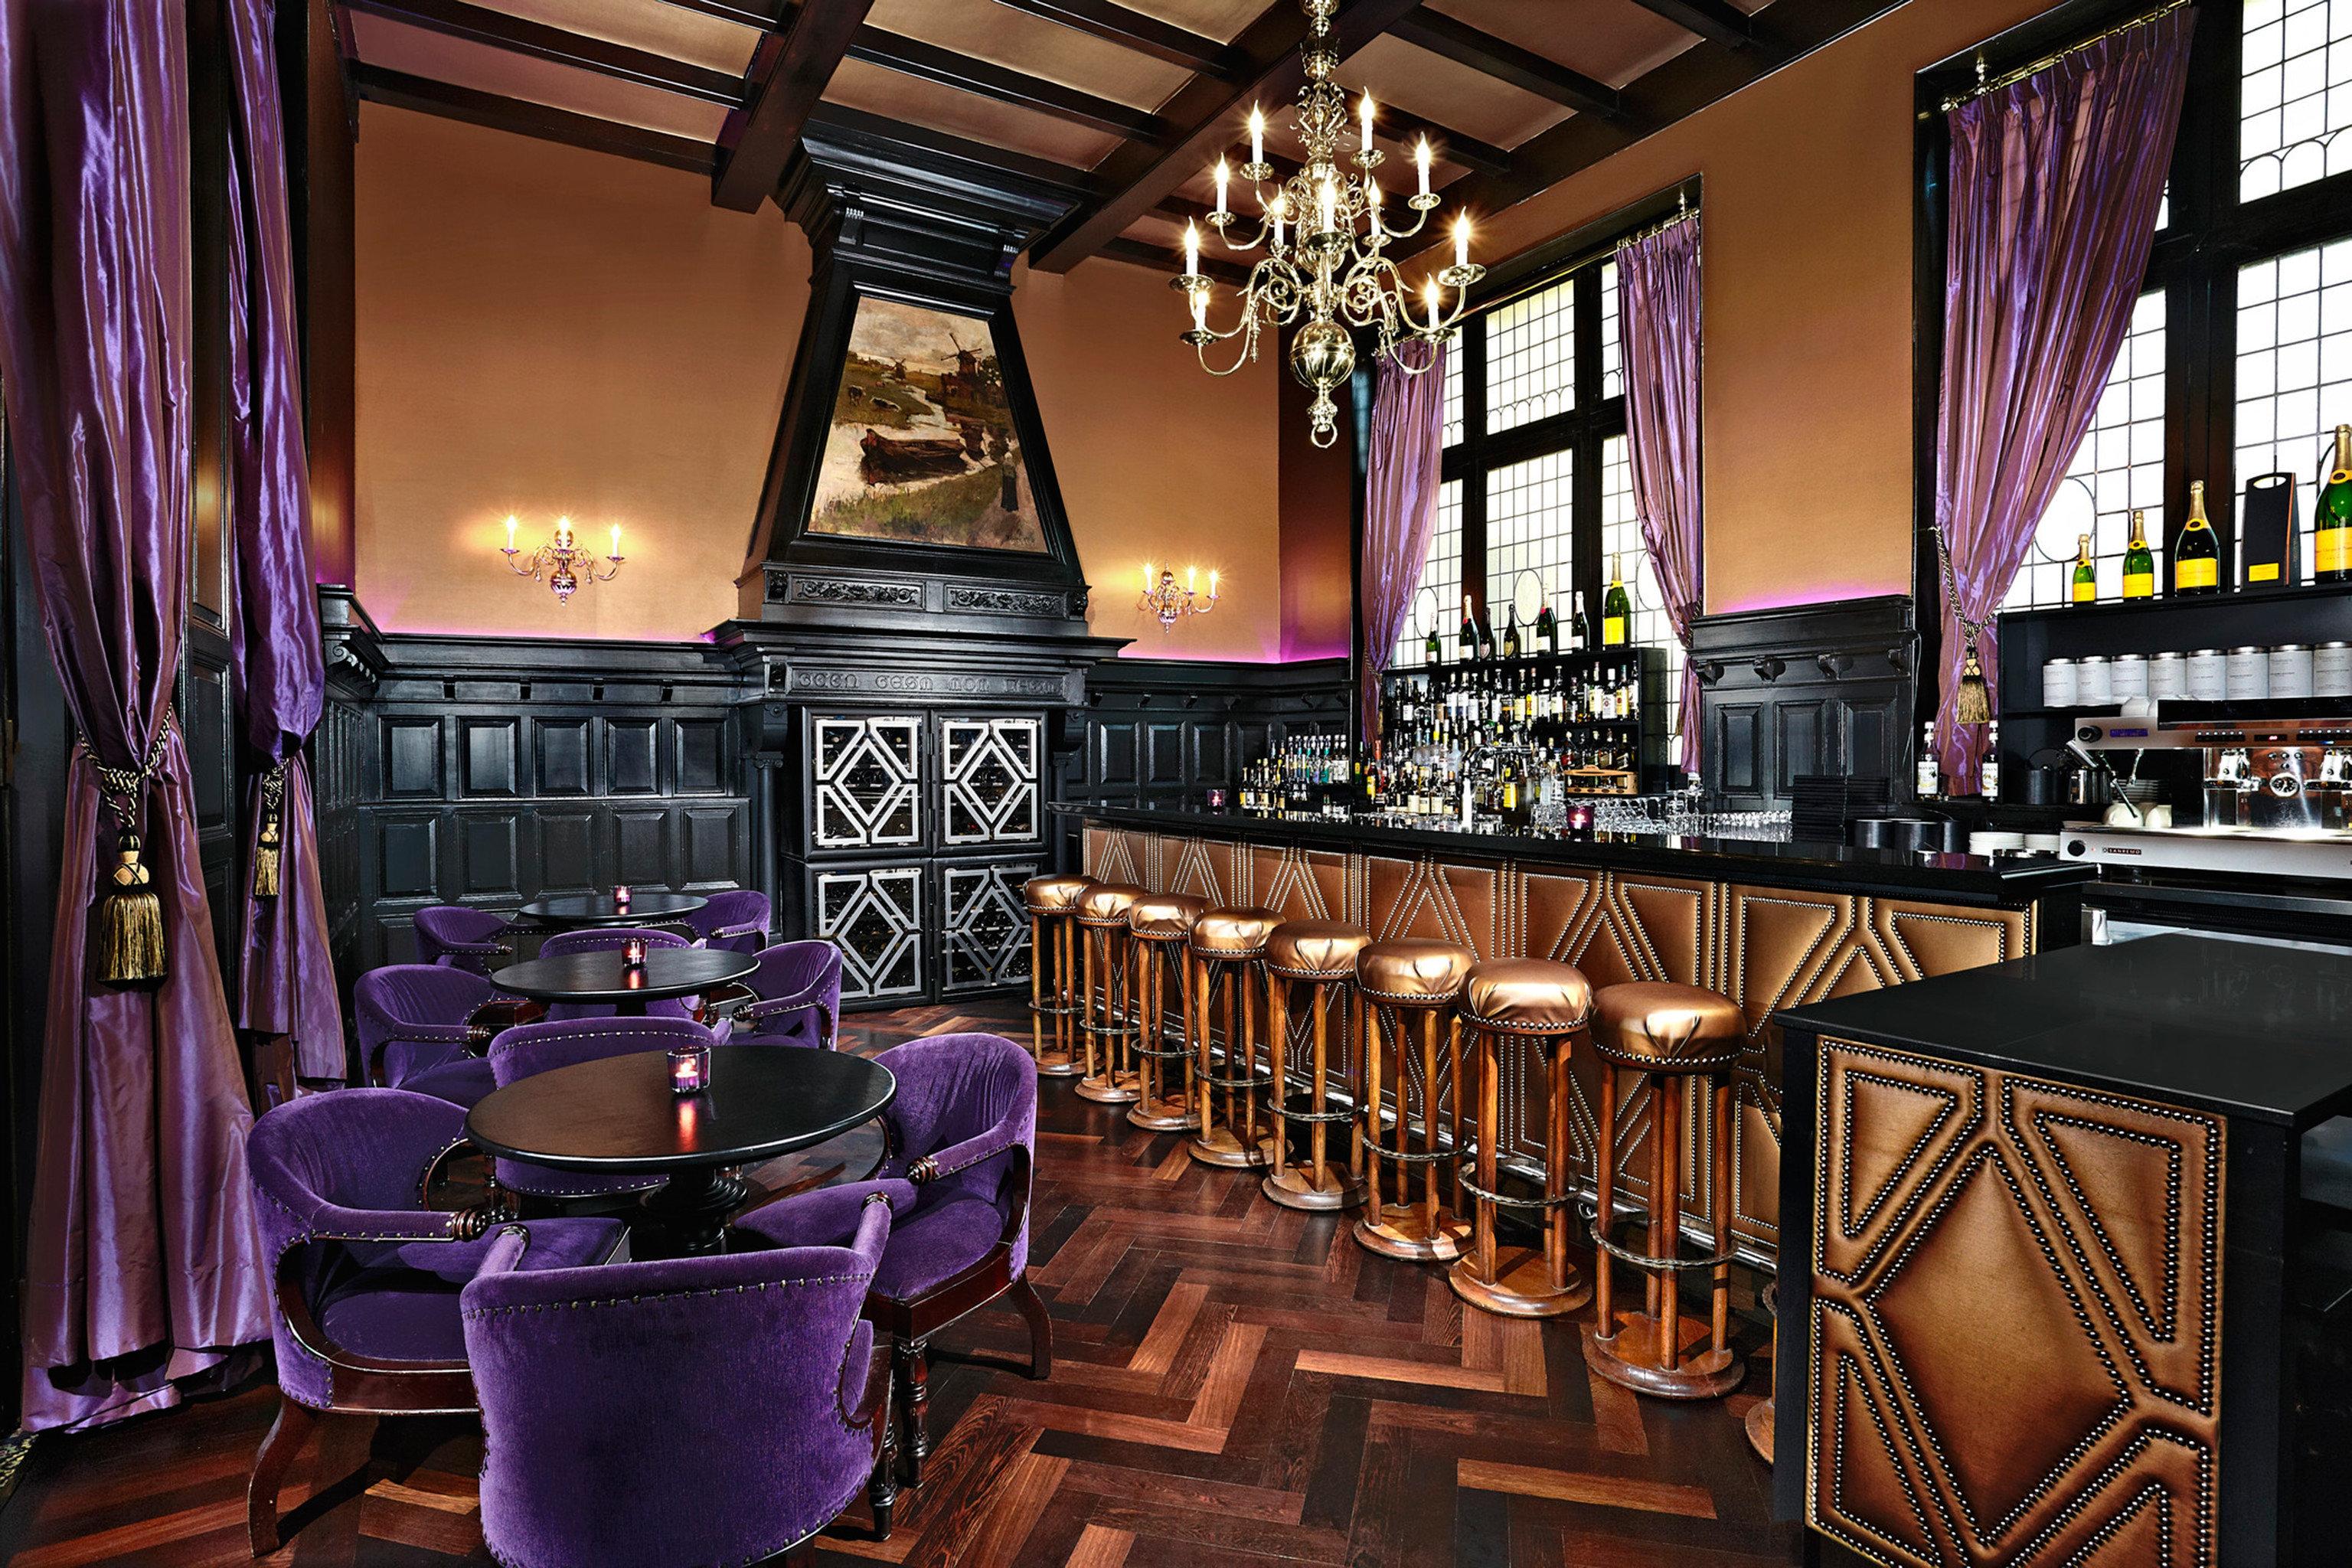 Bar Drink Nightlife Resort chair restaurant recreation room purple nightclub